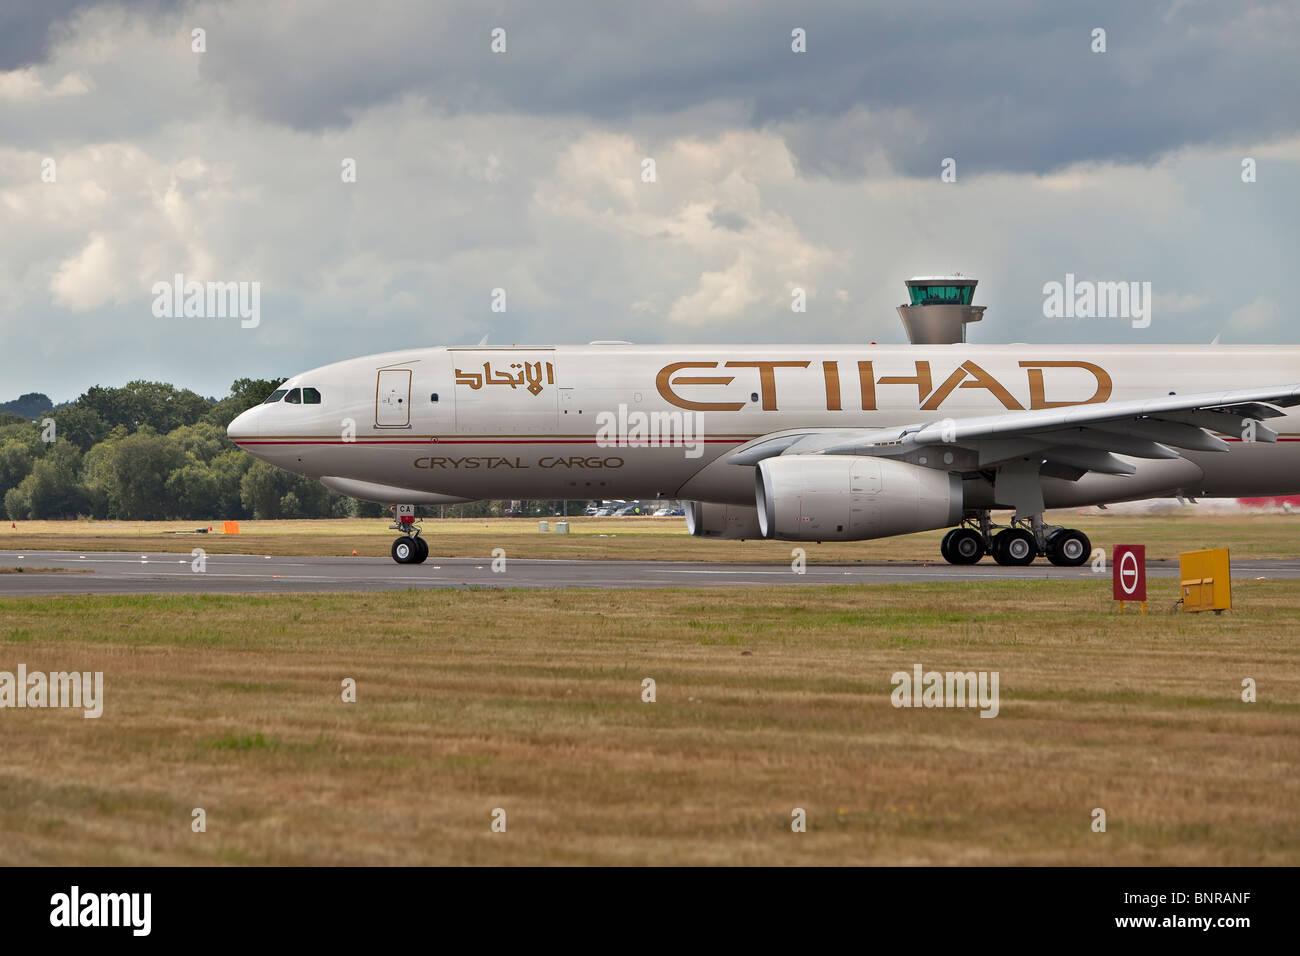 Etihad airways airplane - Stock Image